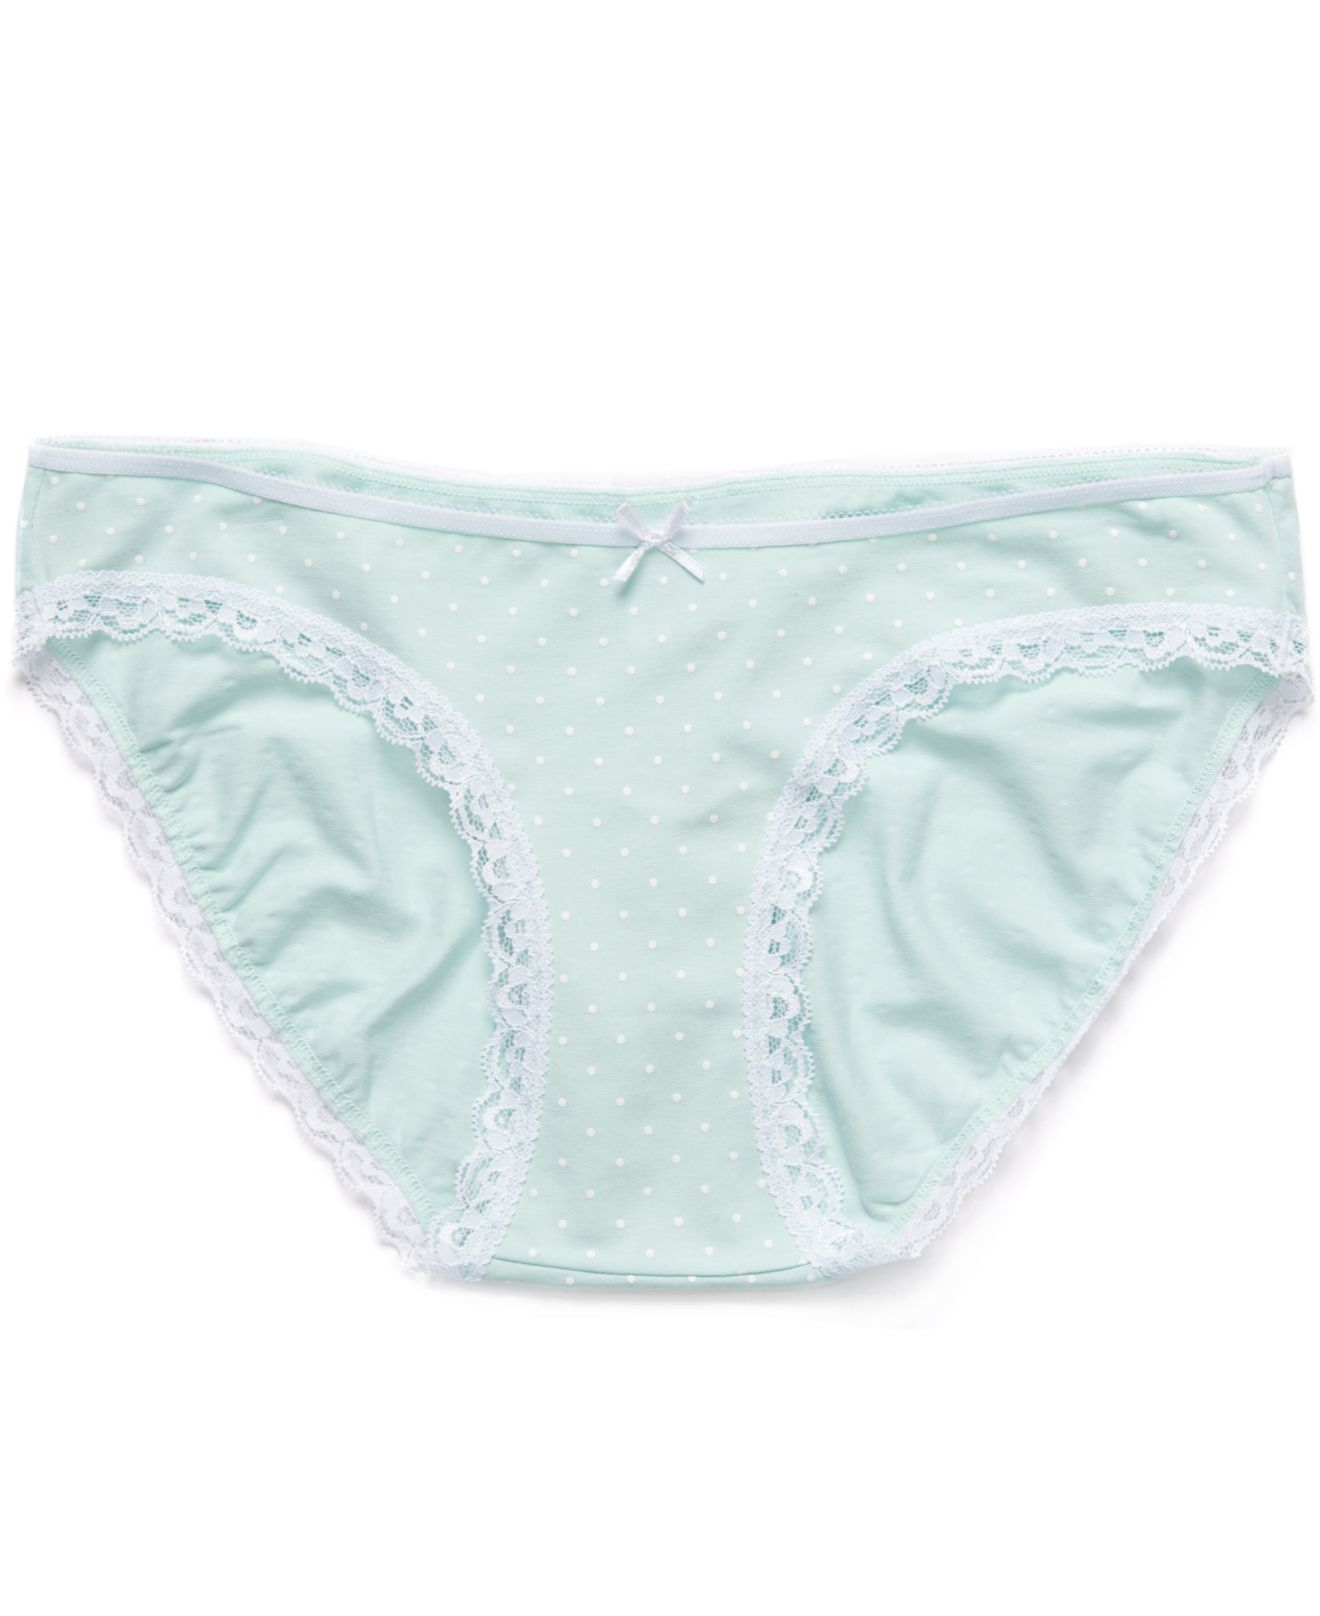 0c2354f3e9900 Jessica Simpson Maternity Polka-dot Bikini Panties in Green - Lyst